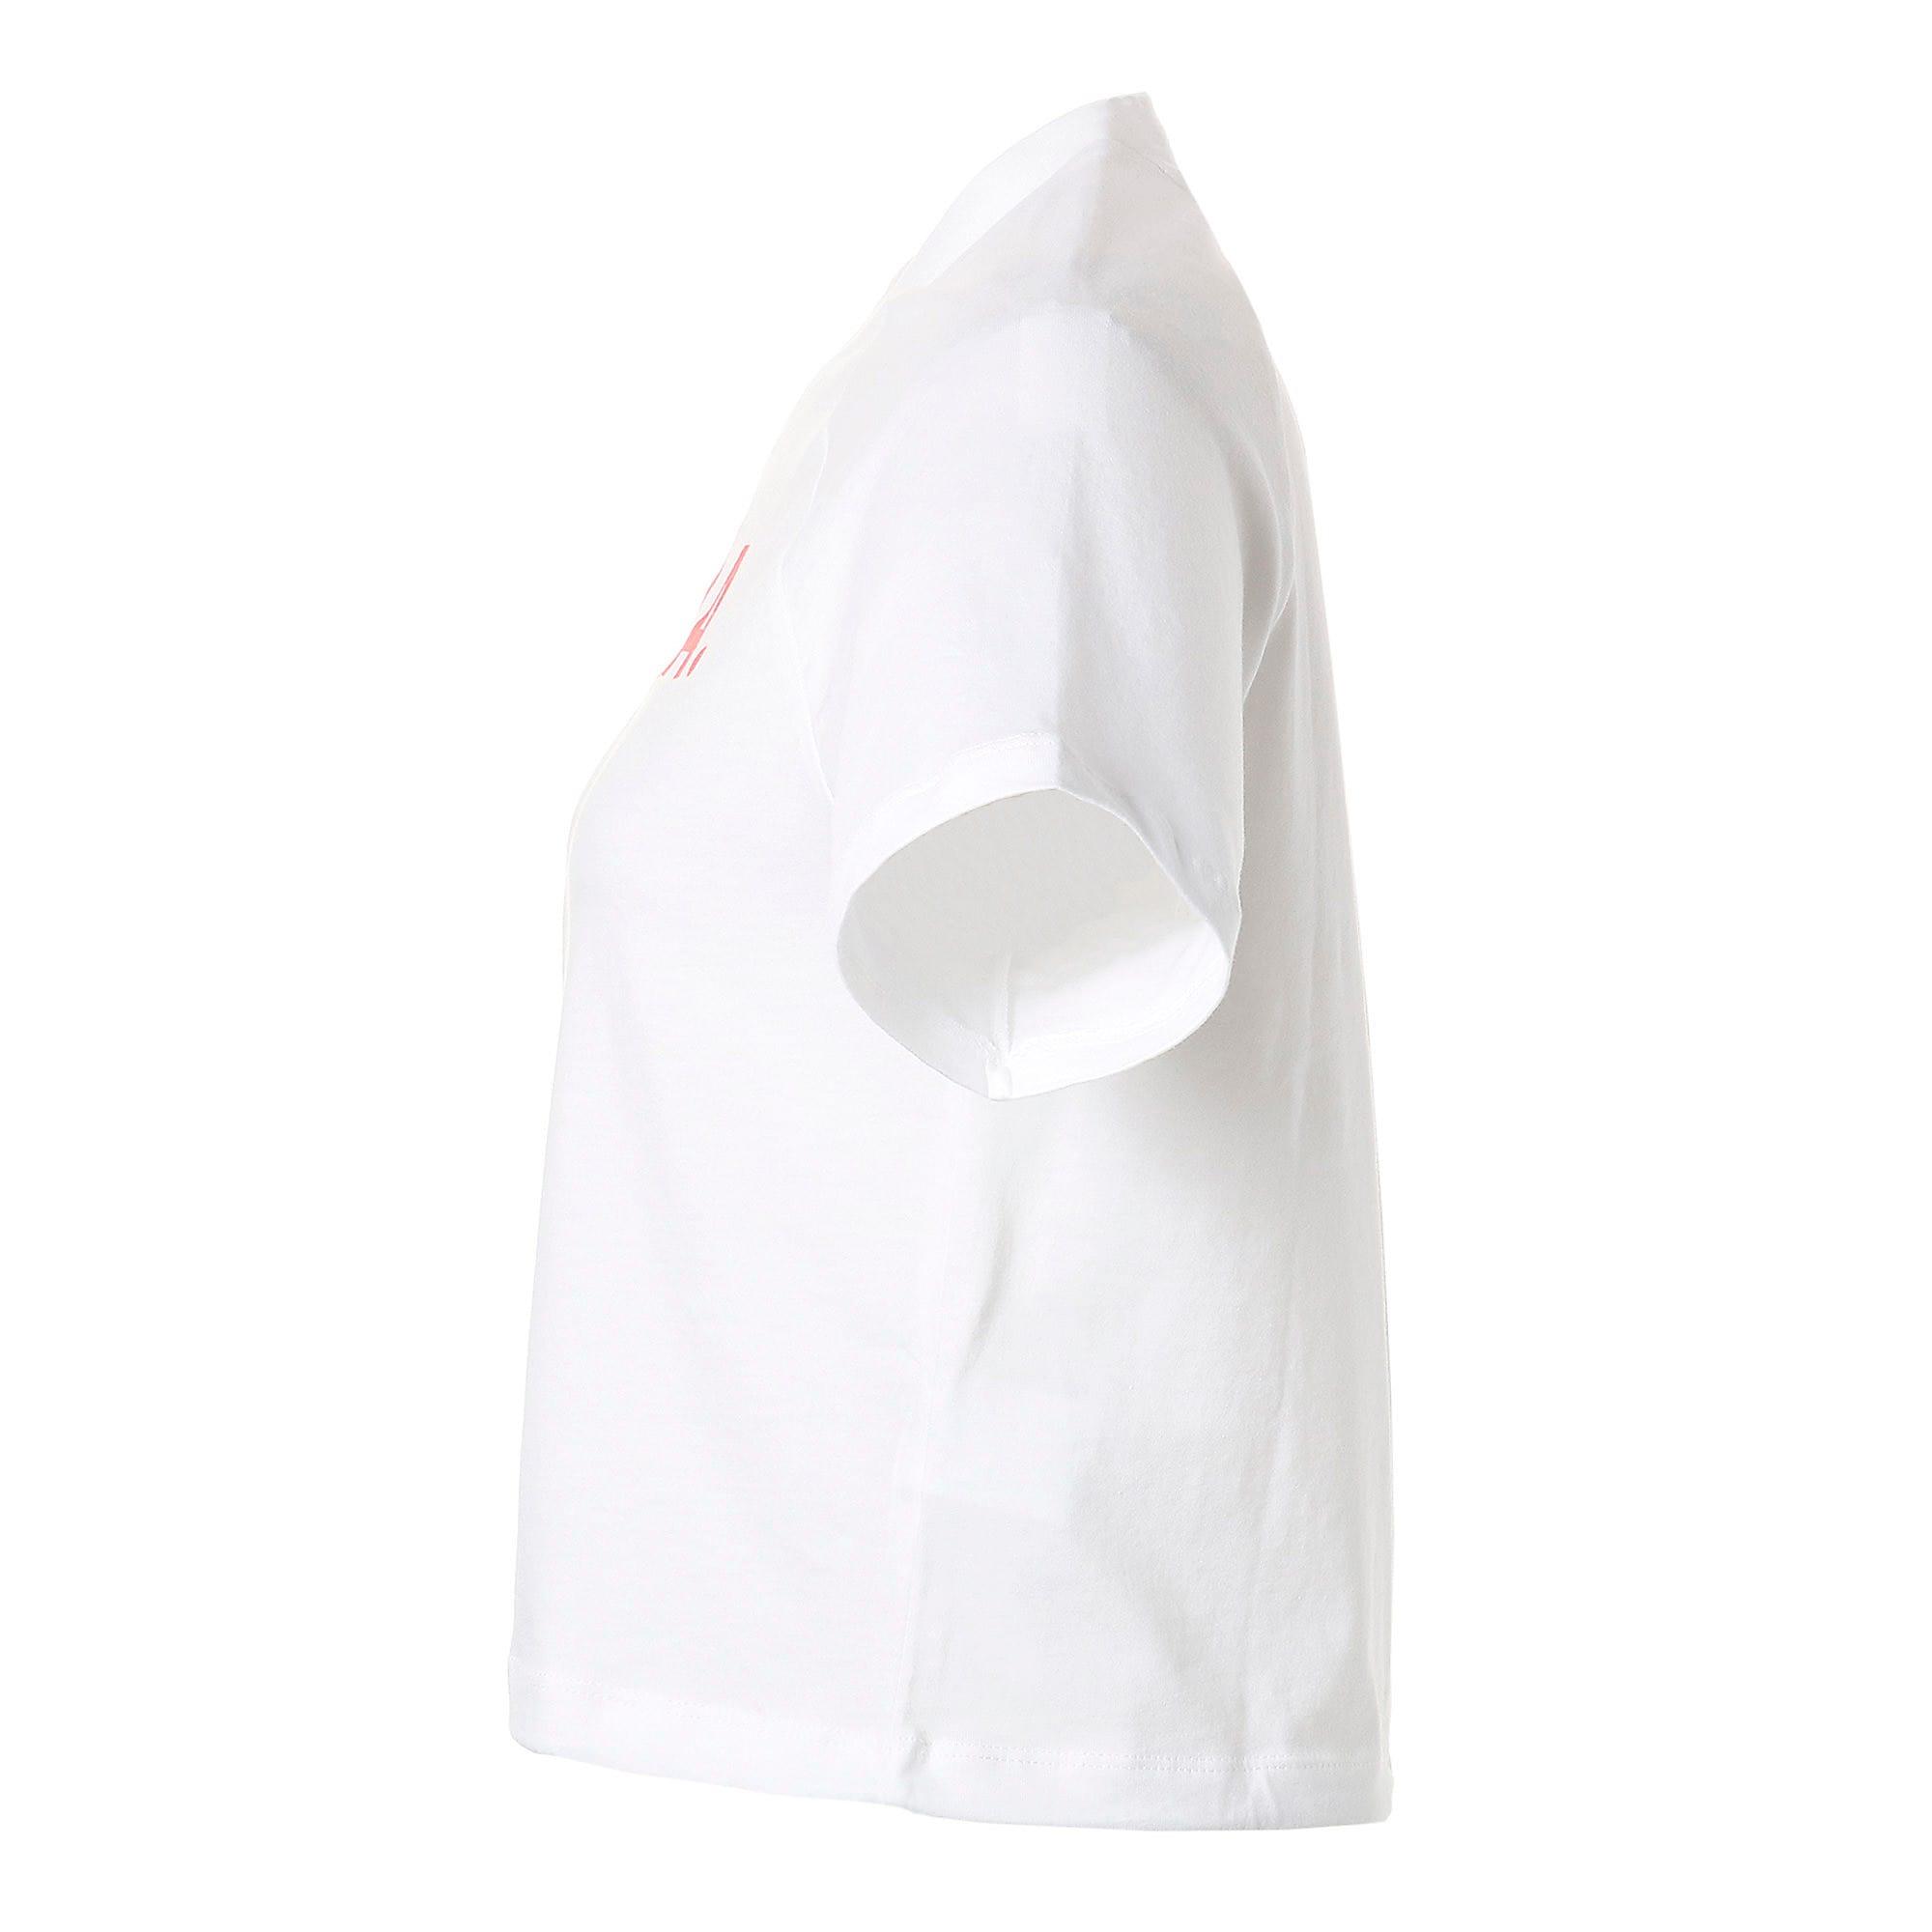 Thumbnail 6 of CHASE V SS ウィメンズ Tシャツ 半袖, Puma White, medium-JPN